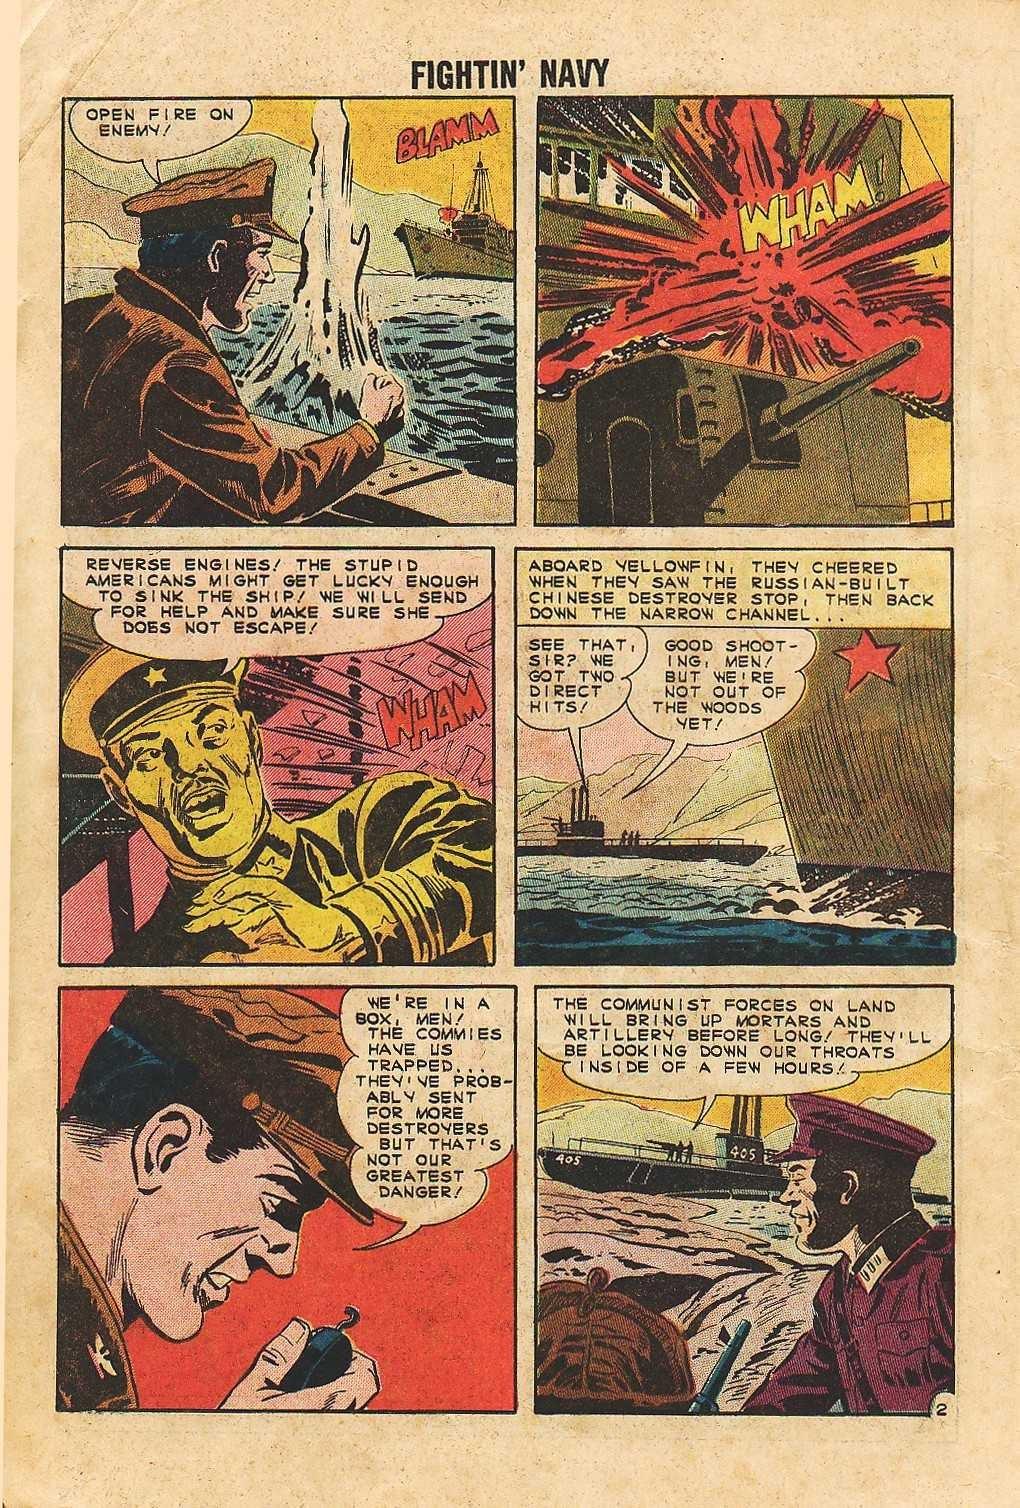 Read online Fightin' Navy comic -  Issue #105 - 16